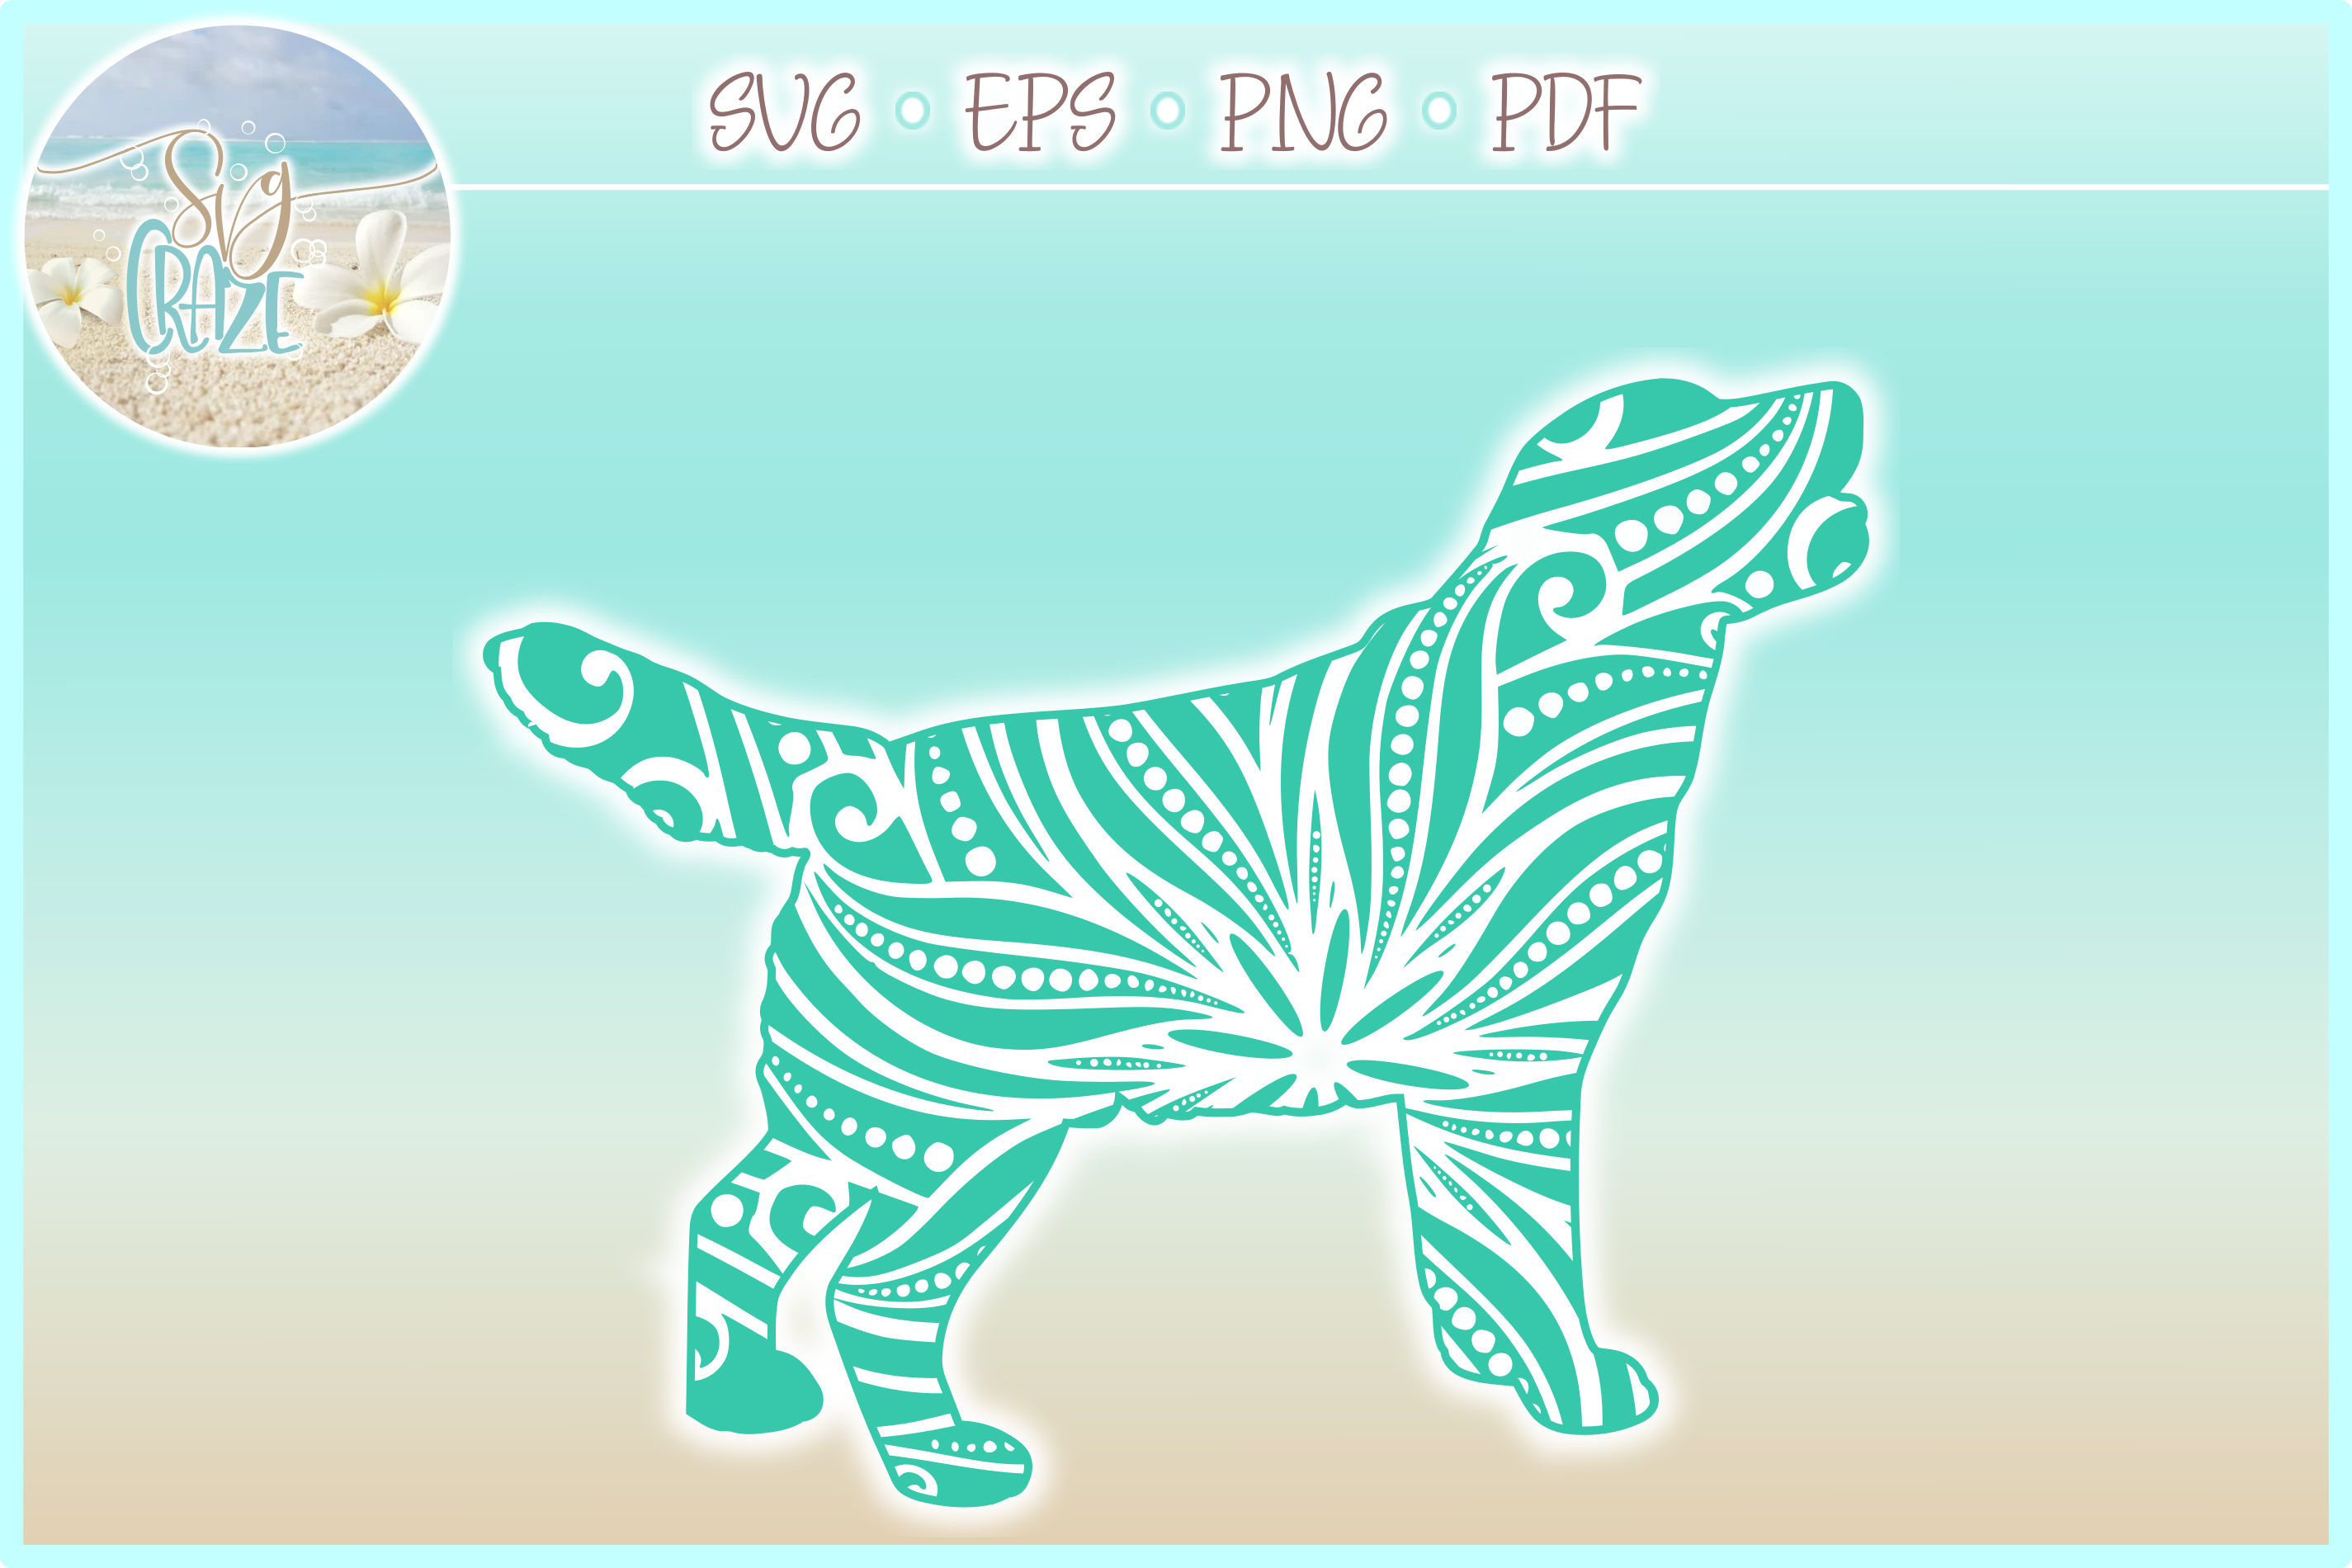 Golden Retriever Mandala Zentangle Bundle SVG Eps Png PDF example image 2